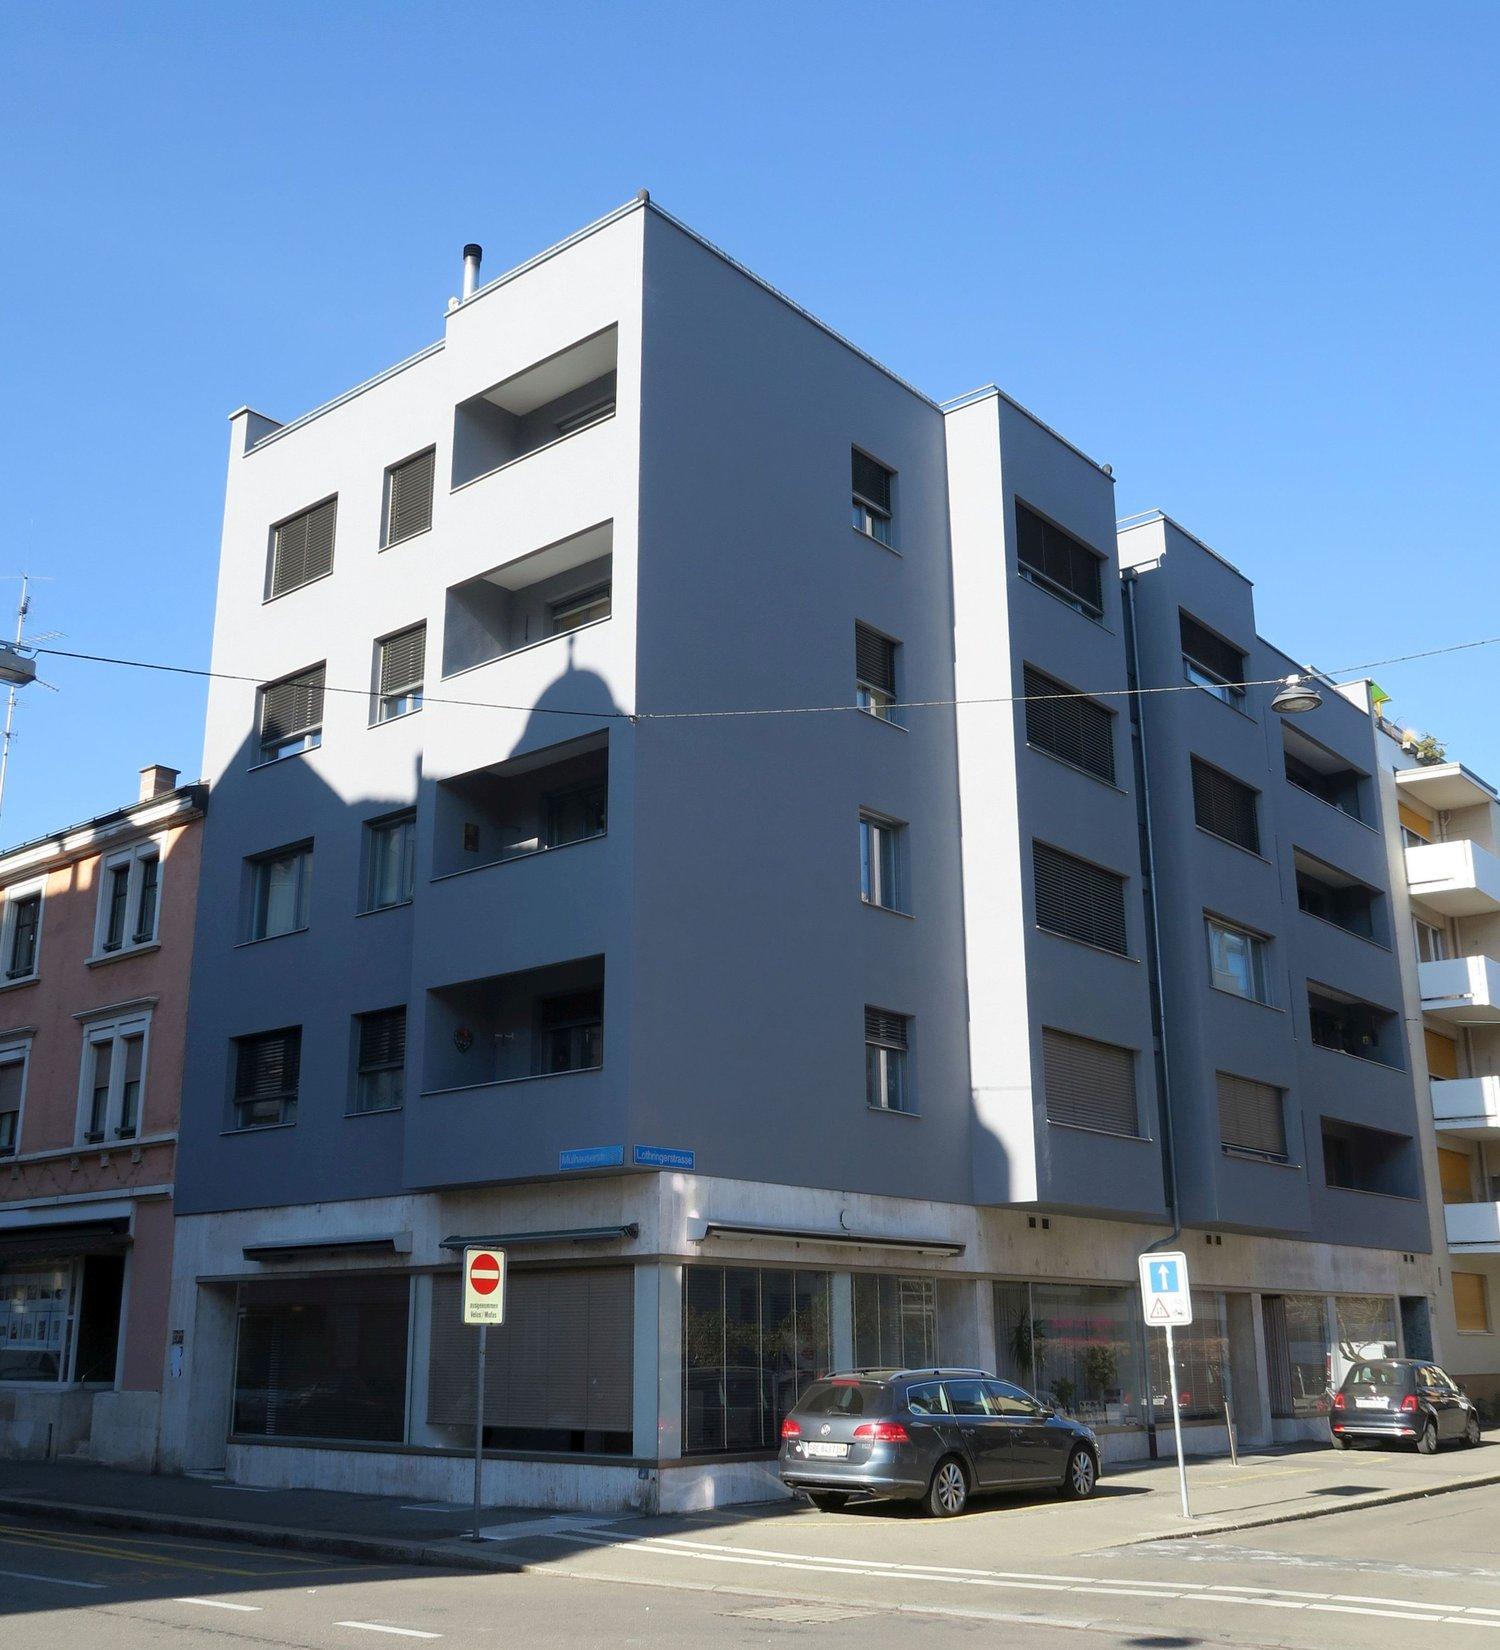 Lothringerstrasse 51